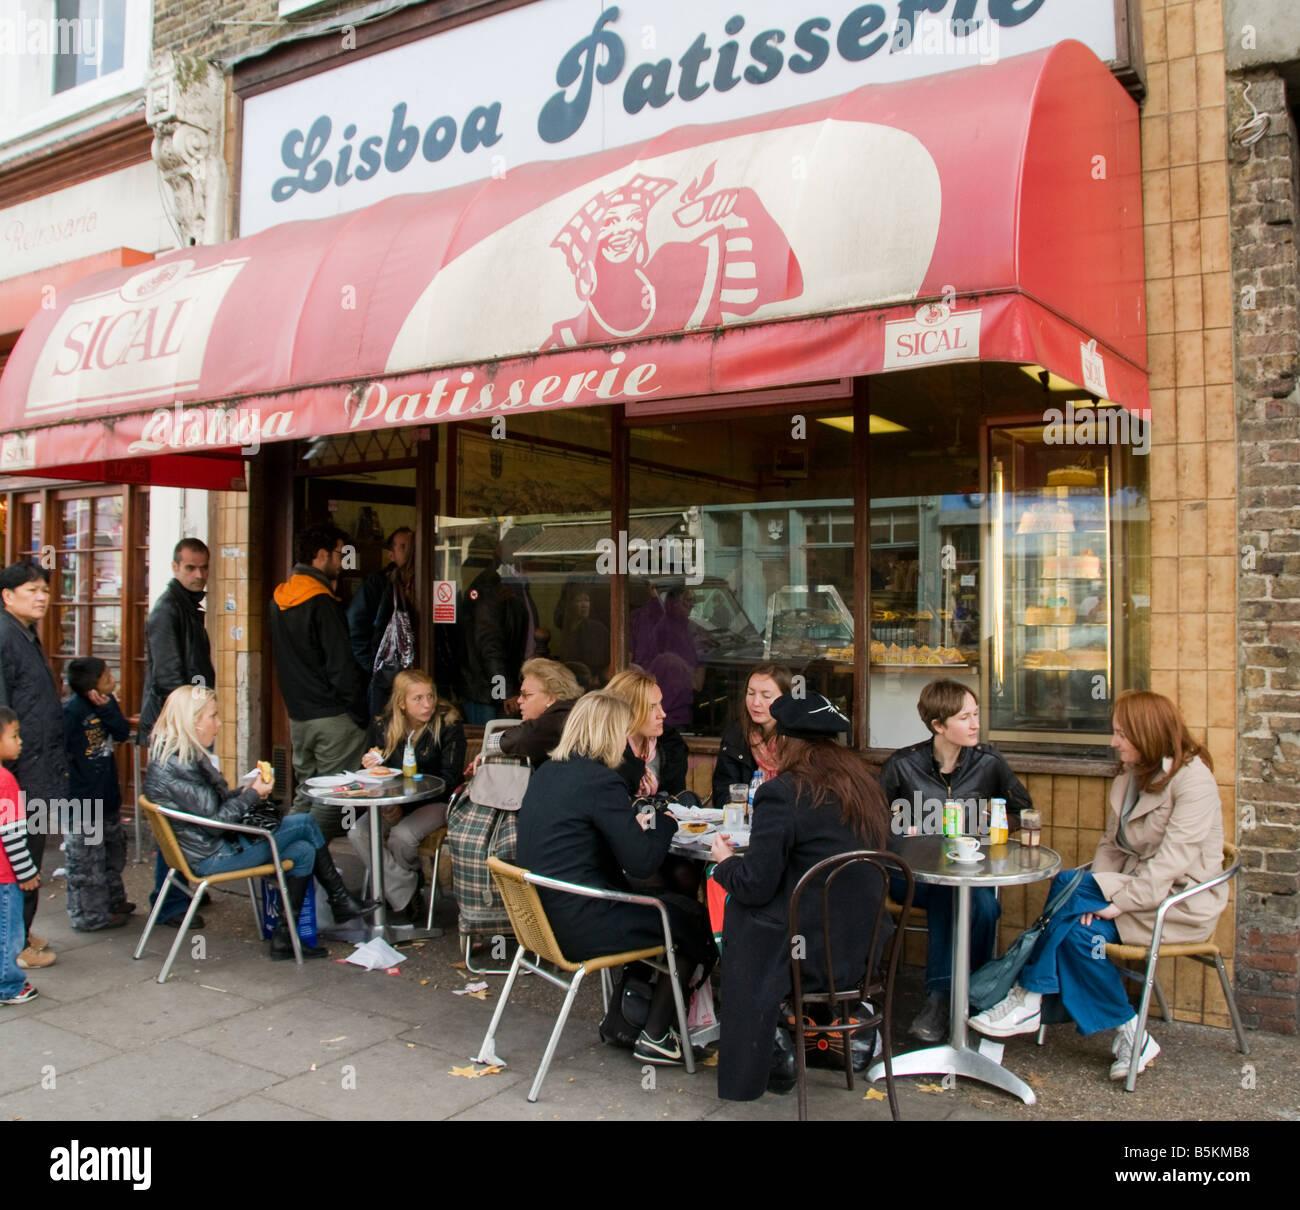 Lisboa Patisserie in Golborne Road London - Stock Image